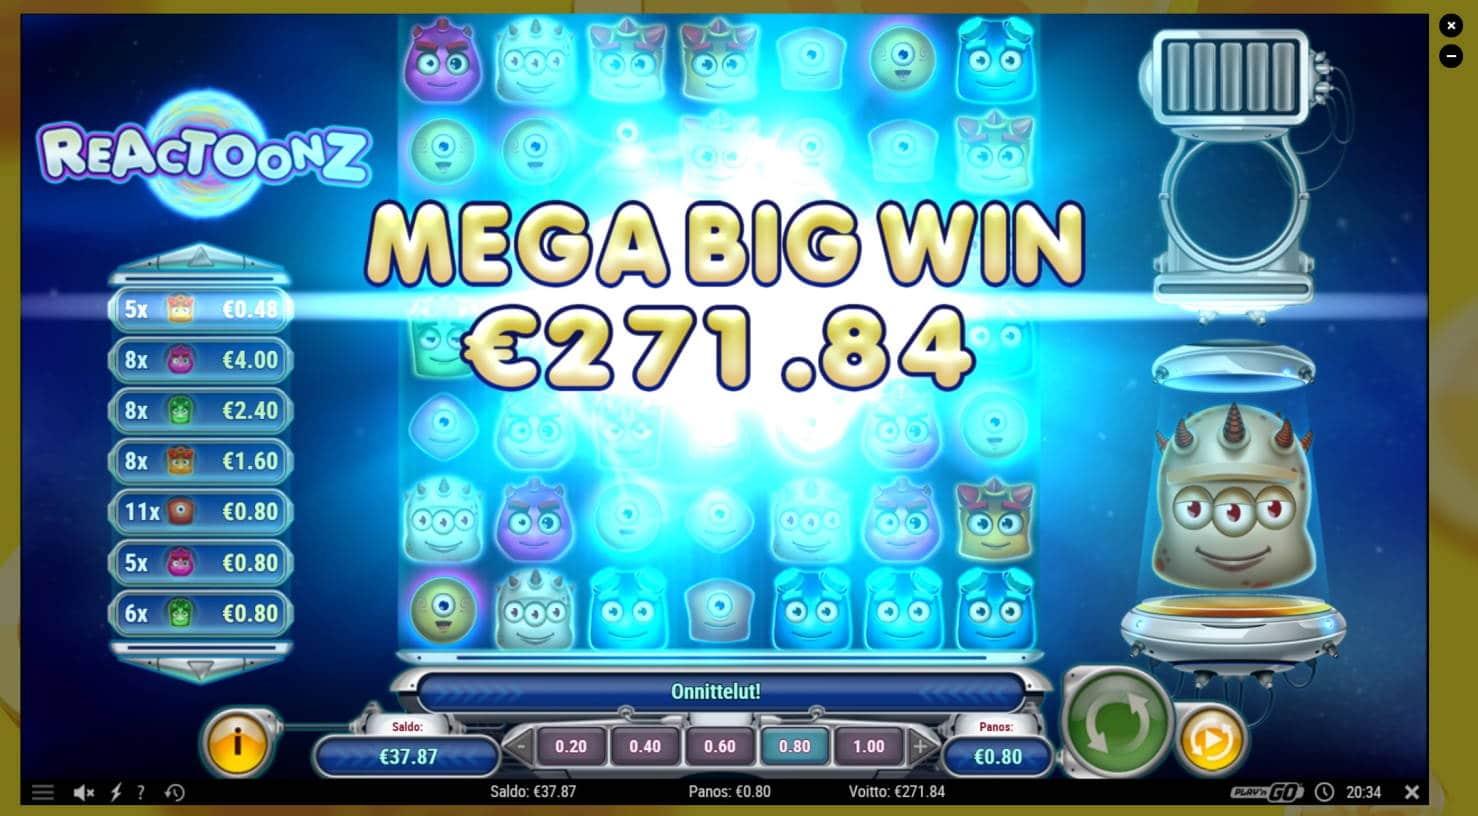 Reactoonz Casino win picture by steppeni 18.8.2021 271.84e 340X